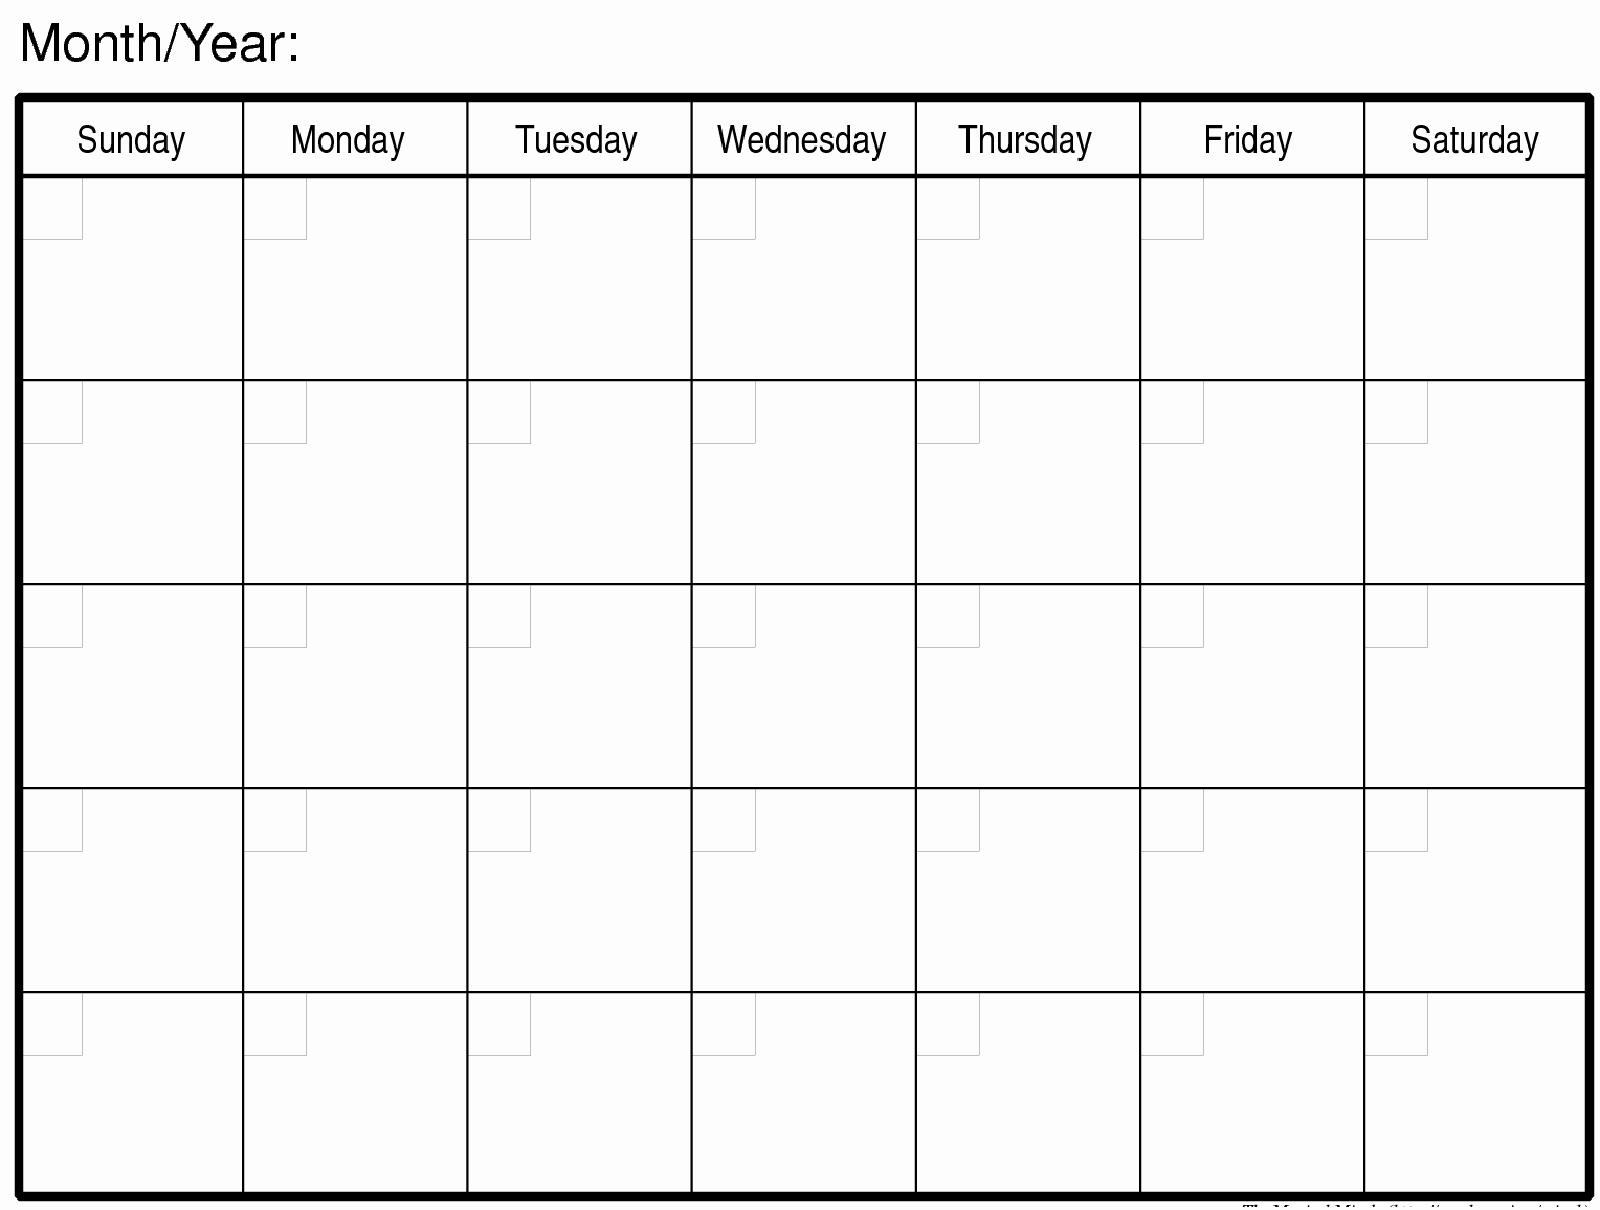 Blank Monthly Calendars To Print Free Calendar 2018  Printable Full Page Monthly Calendar Blank